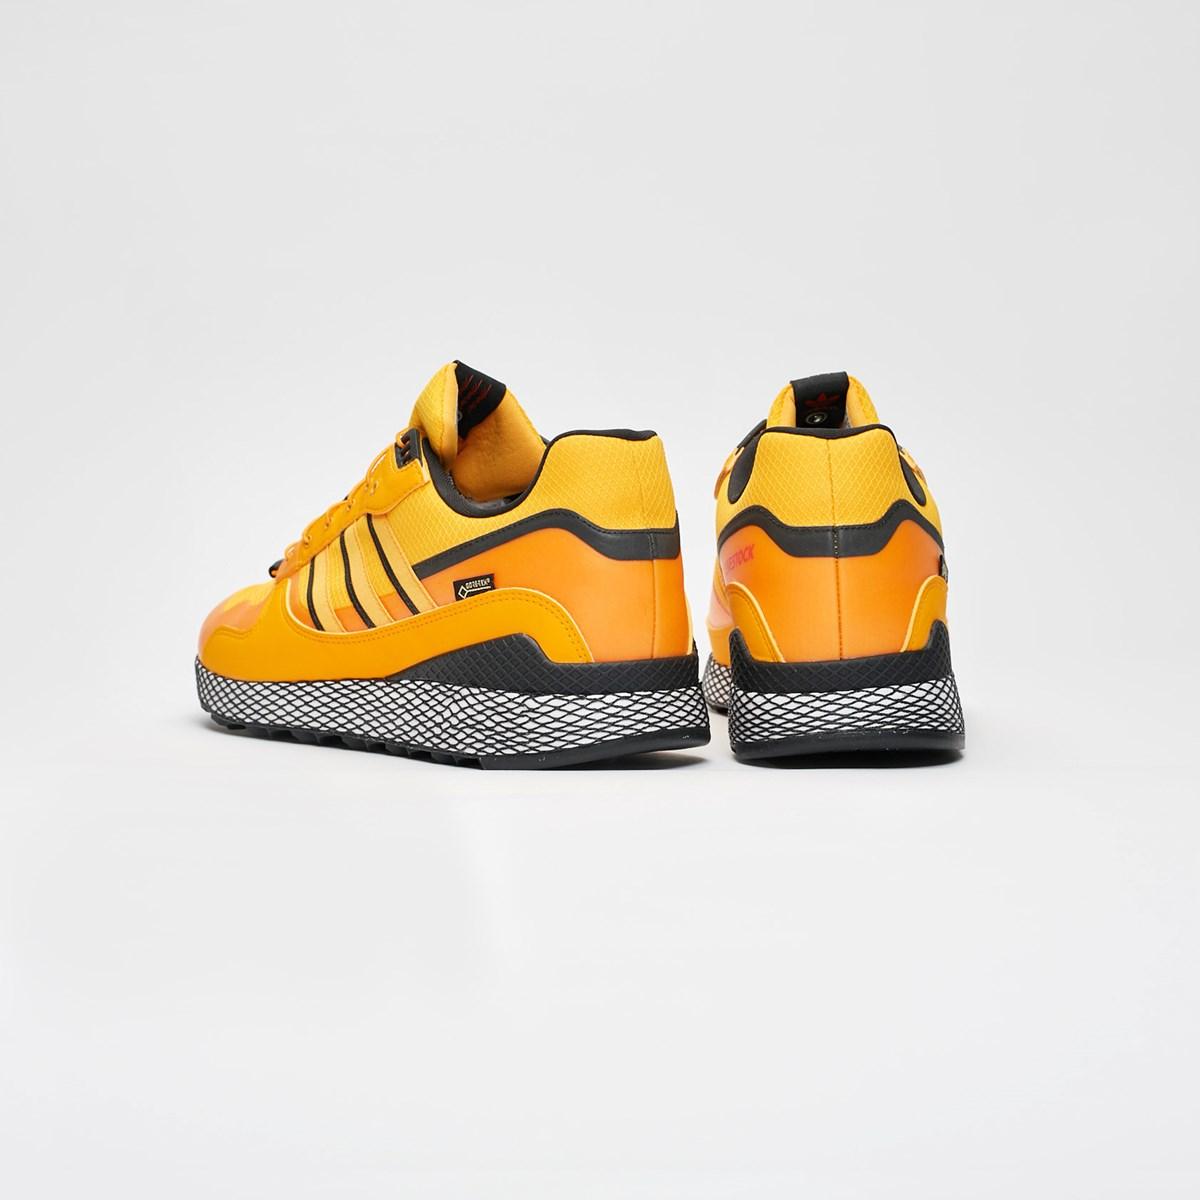 adidas Ultra Tech GORE-TEX LIVESTOCK - B37852 - Sneakersnstuff ... c36c39a4d